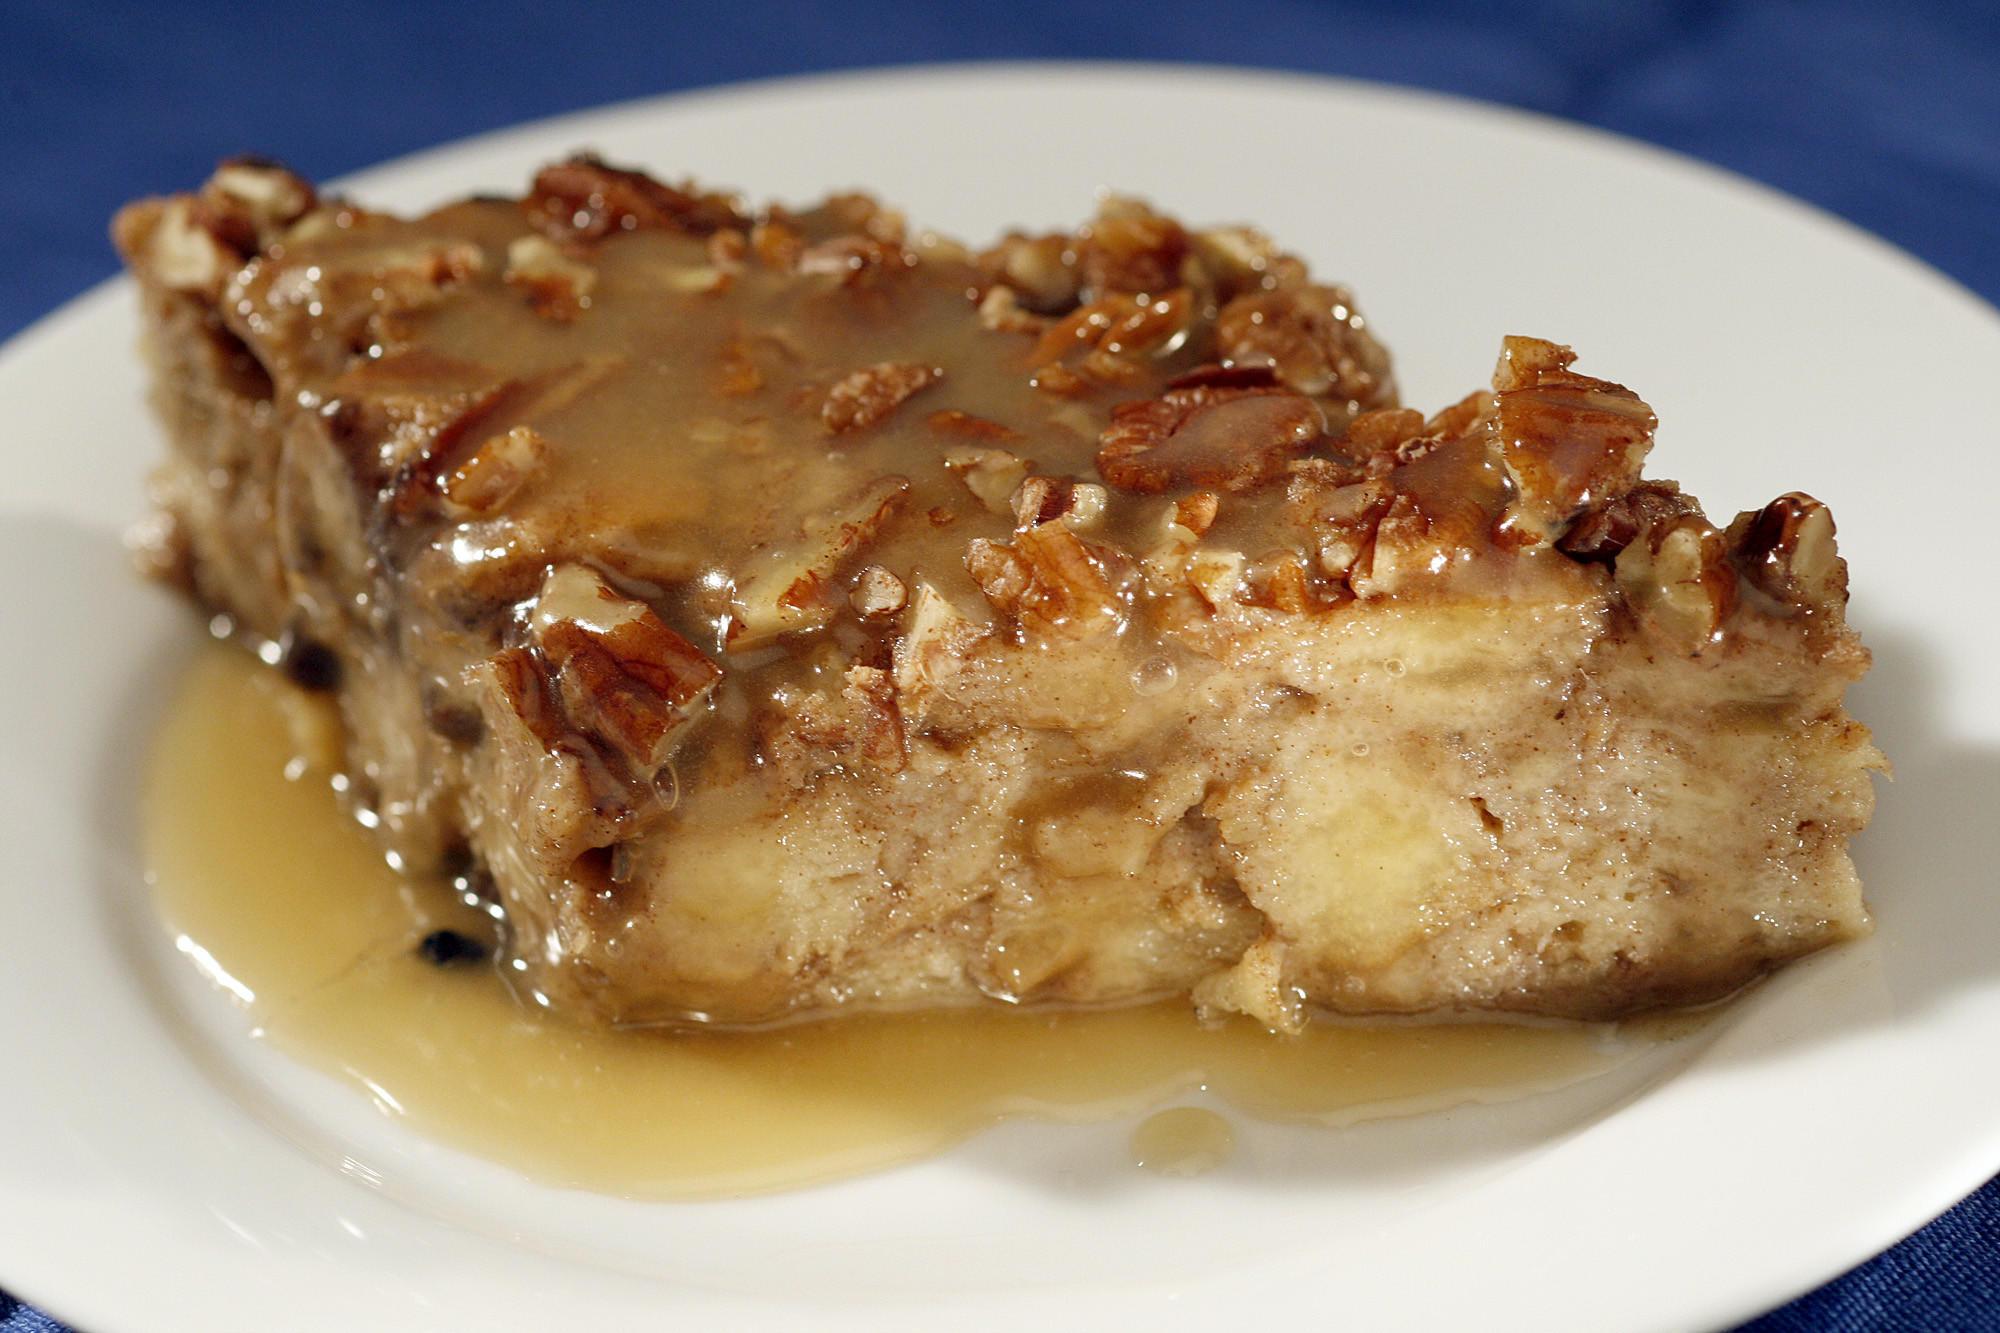 Bread Pudding Dessert  Recipe Zea s sweet potato bread pudding with rum sauce